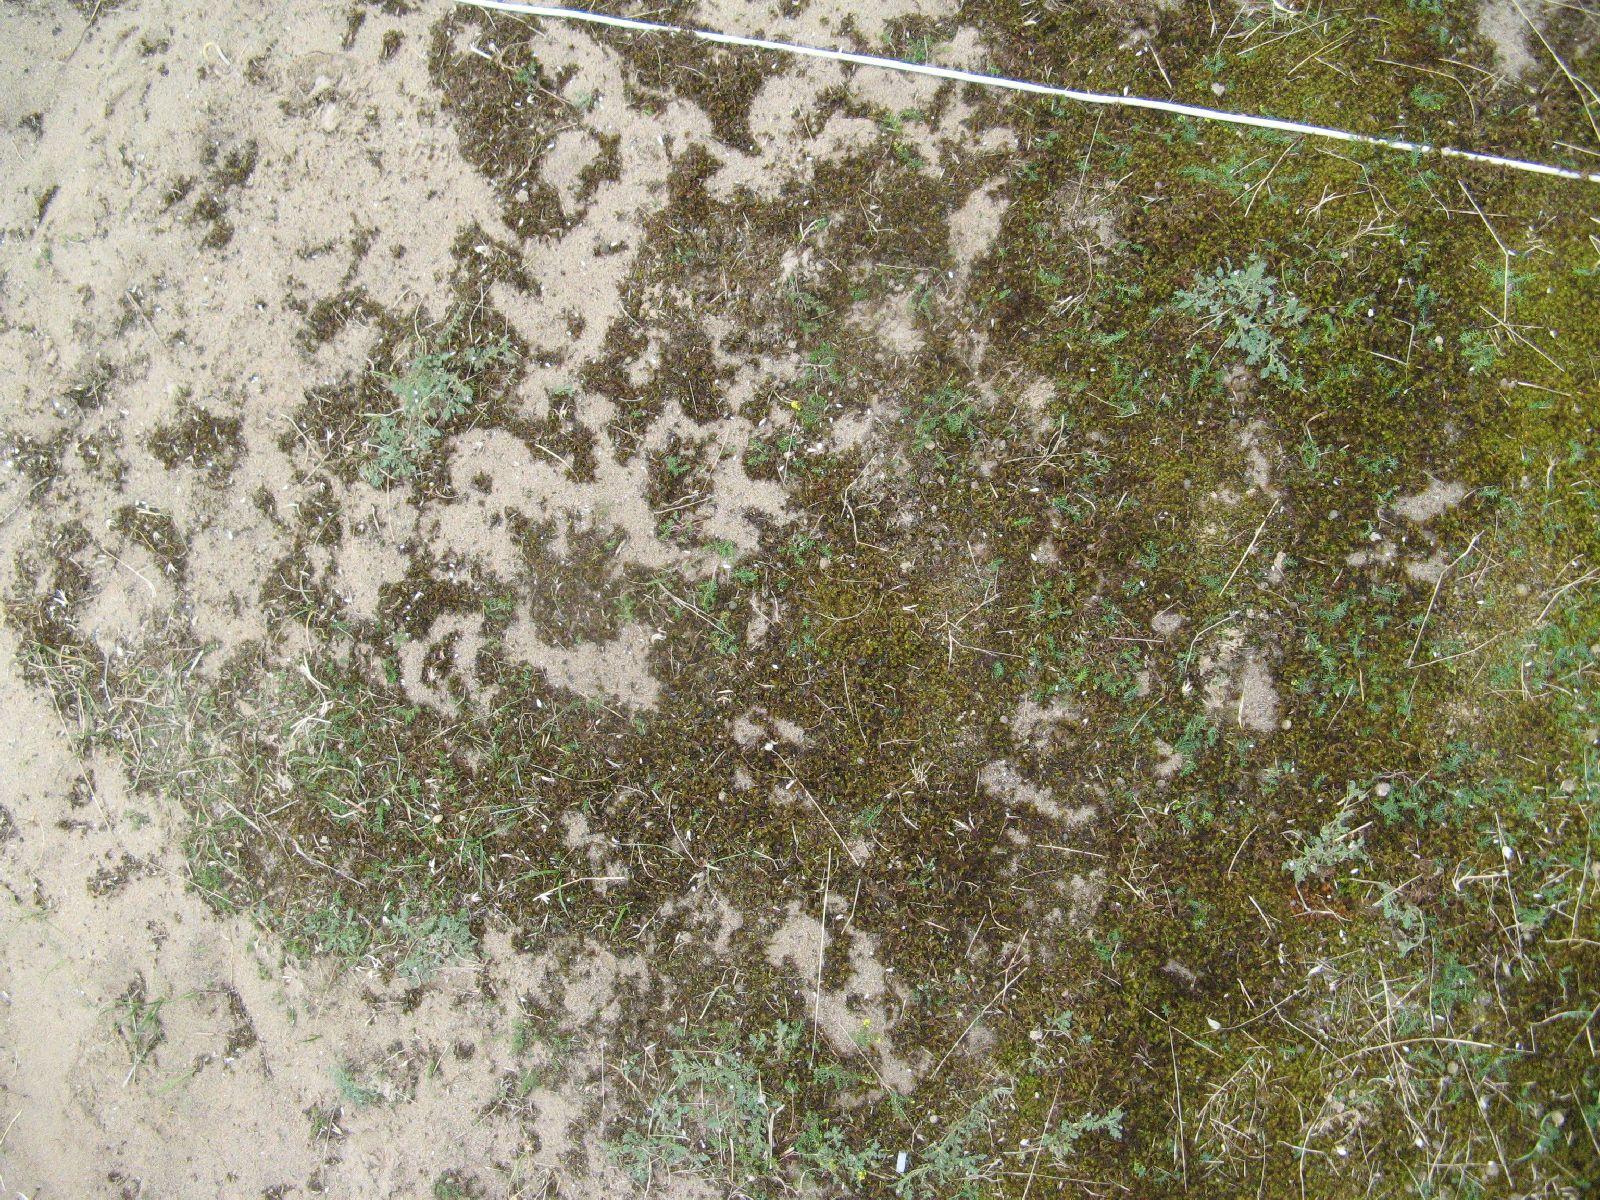 Boden-Gras-Moos-Blumen_Textur_B_2112